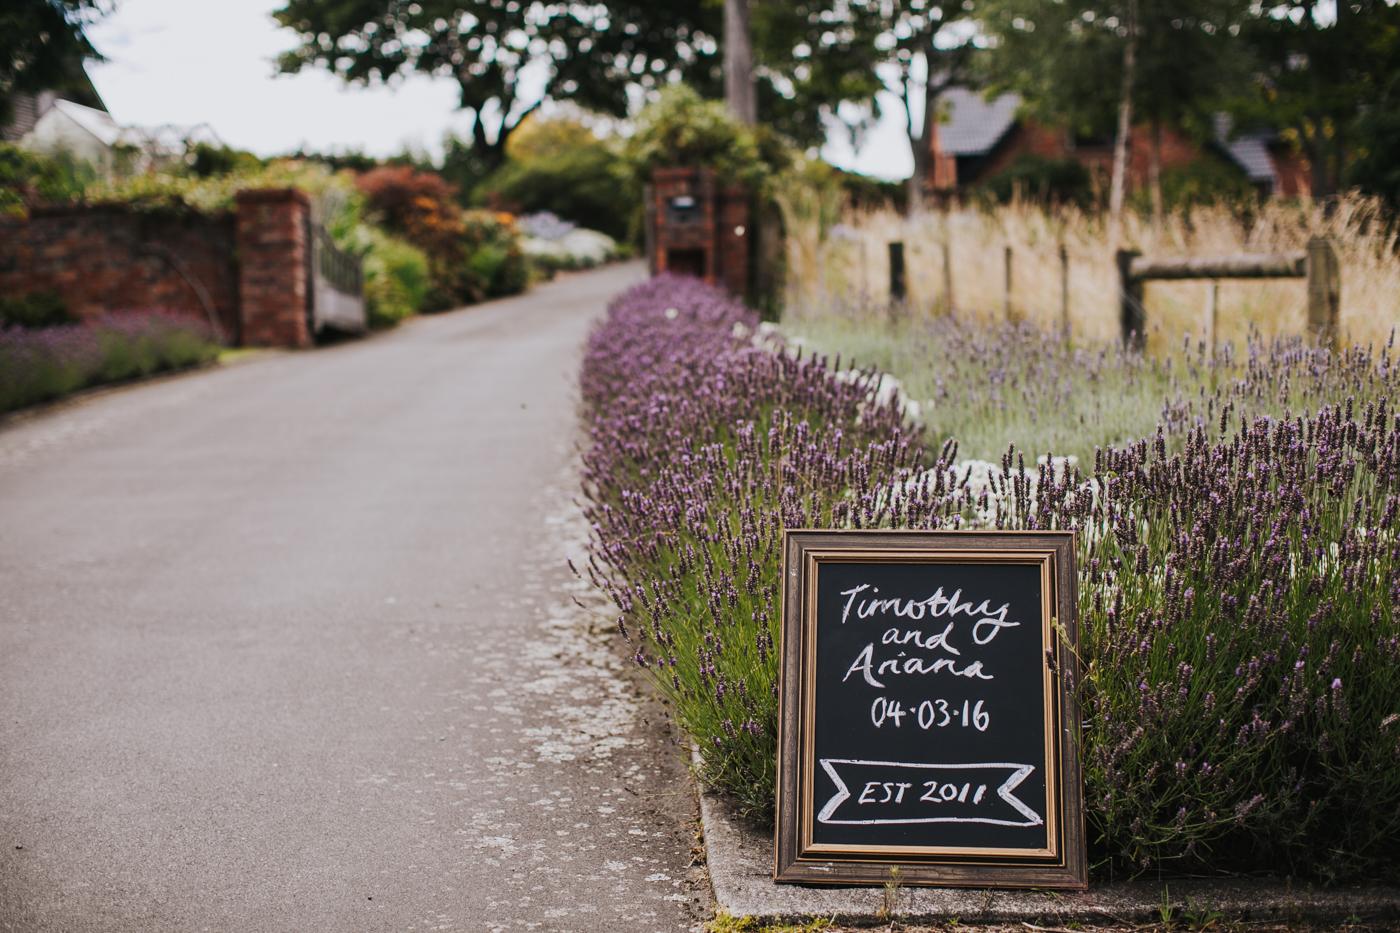 Ariana & Tim - Dunedin, New Zealand Wedding - Destination Wedding - Samantha Heather Photography-64.jpg